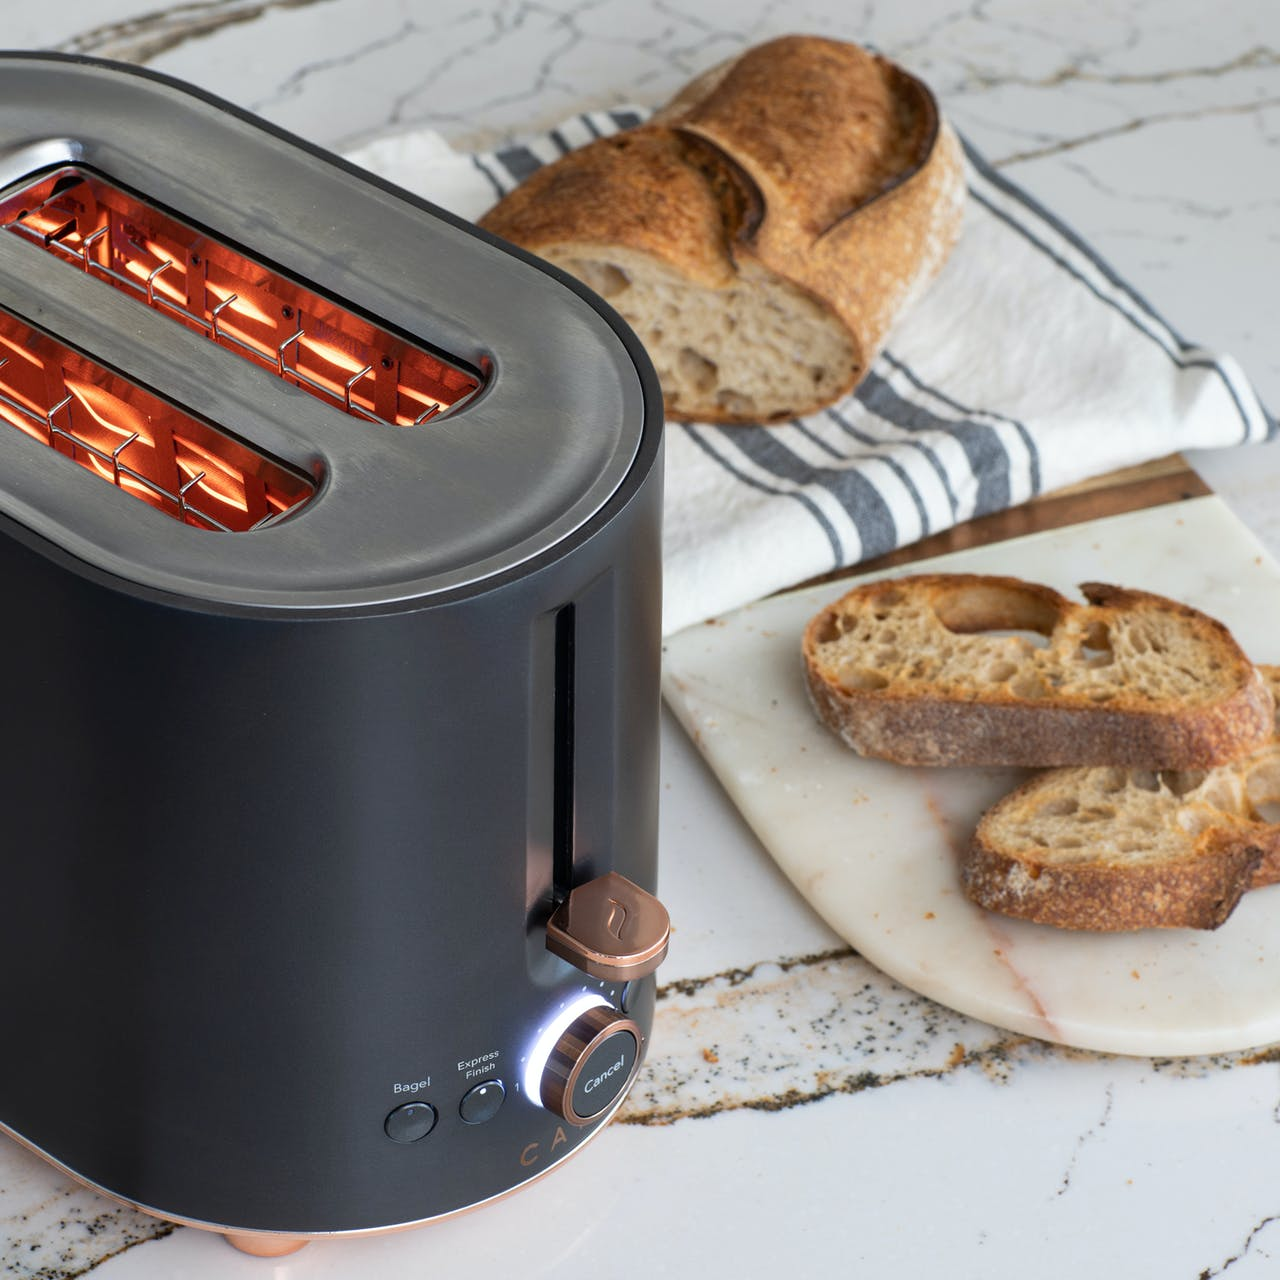 express finish mode on café toaster